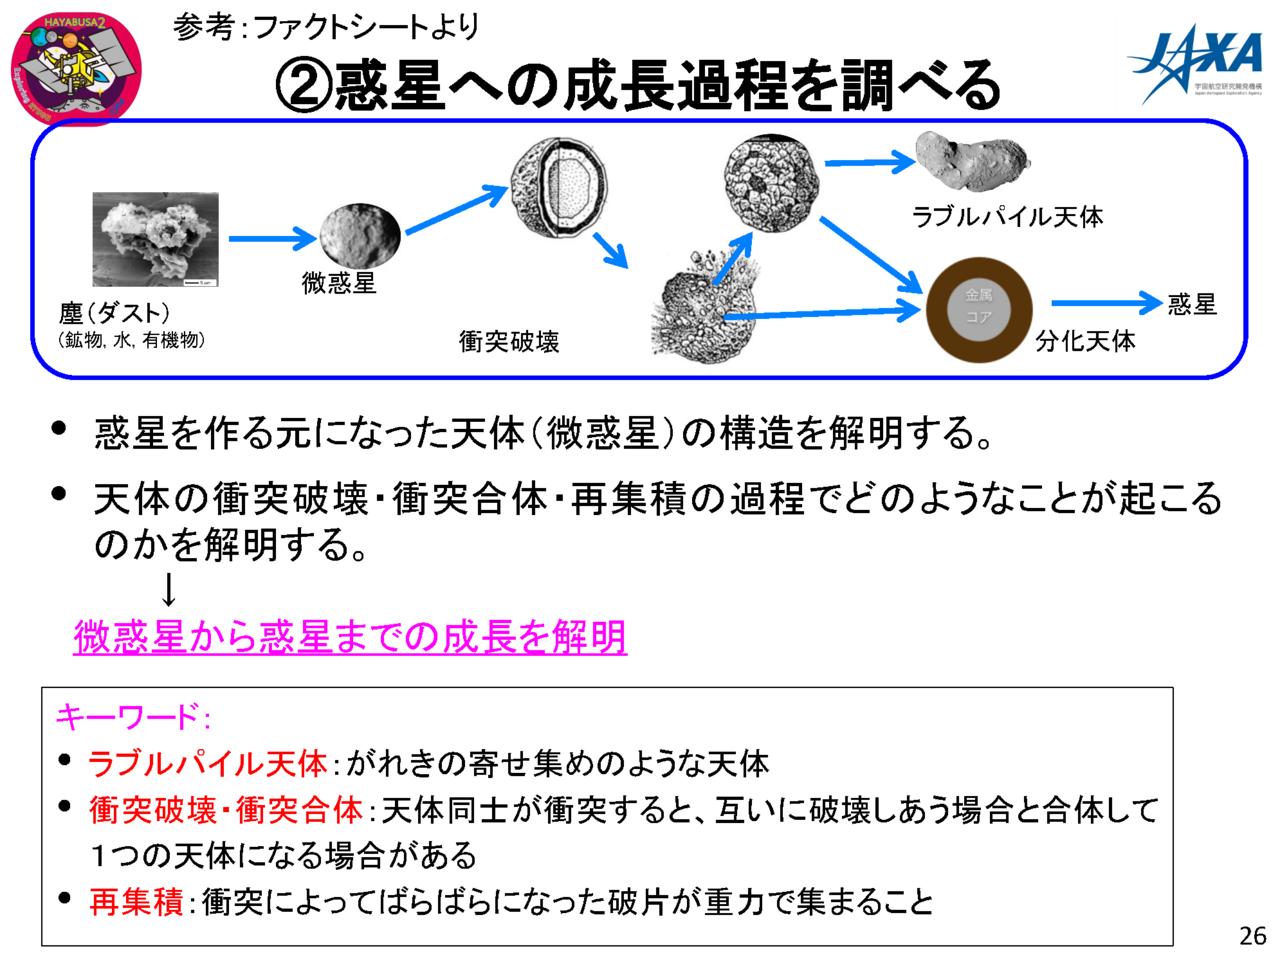 f:id:Imamura:20180719131721p:plain